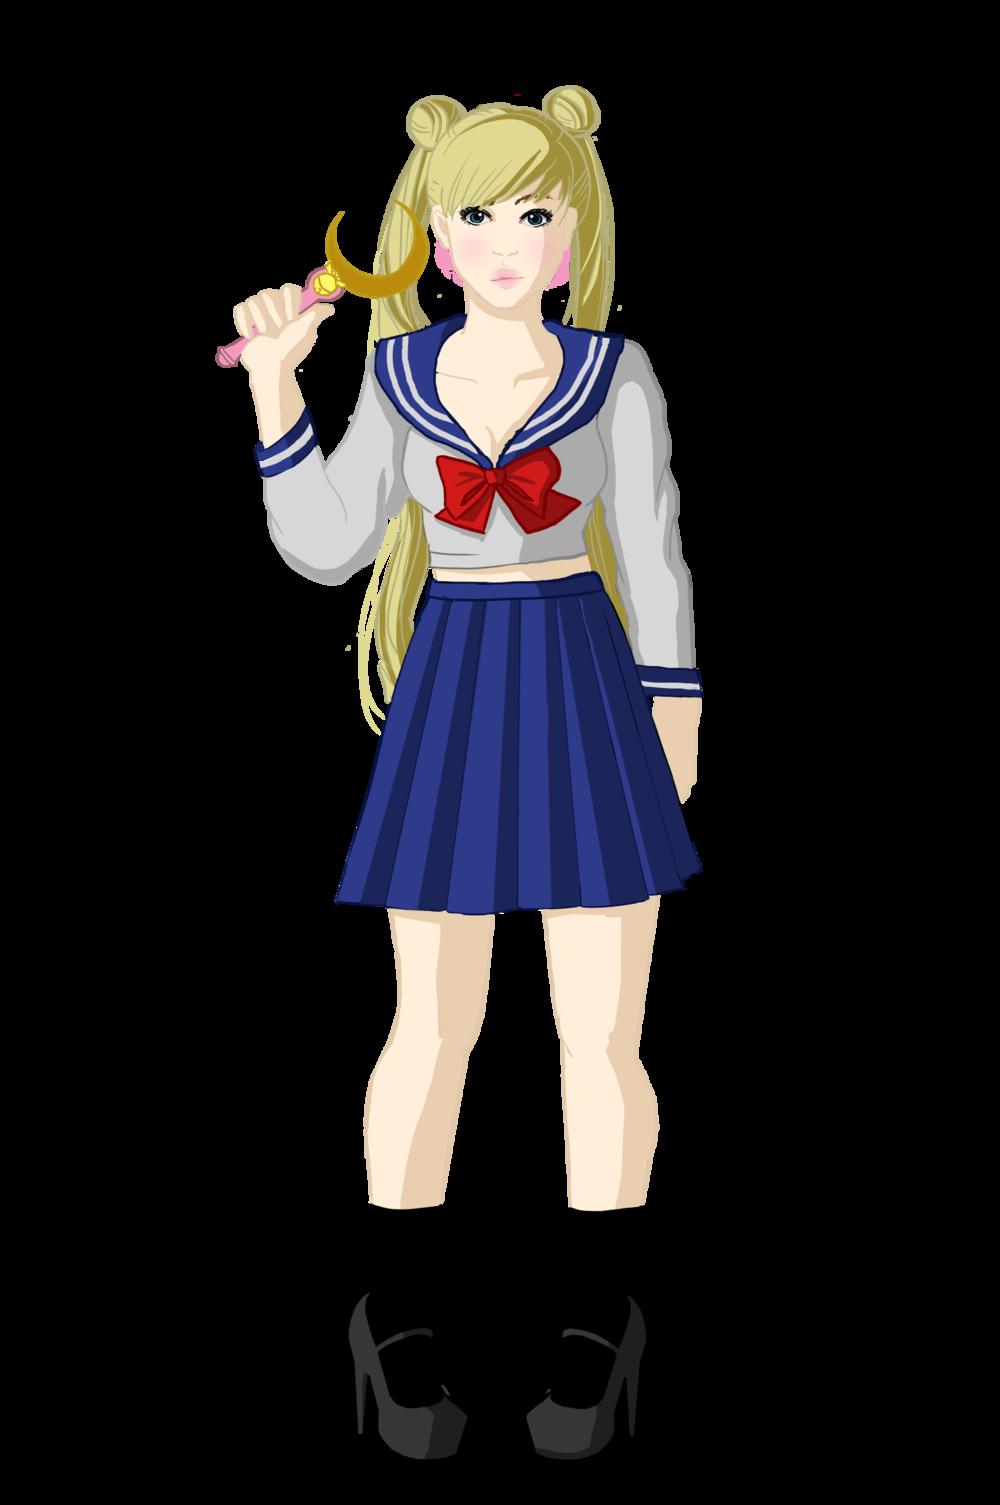 Usagi, from Sailor Moon